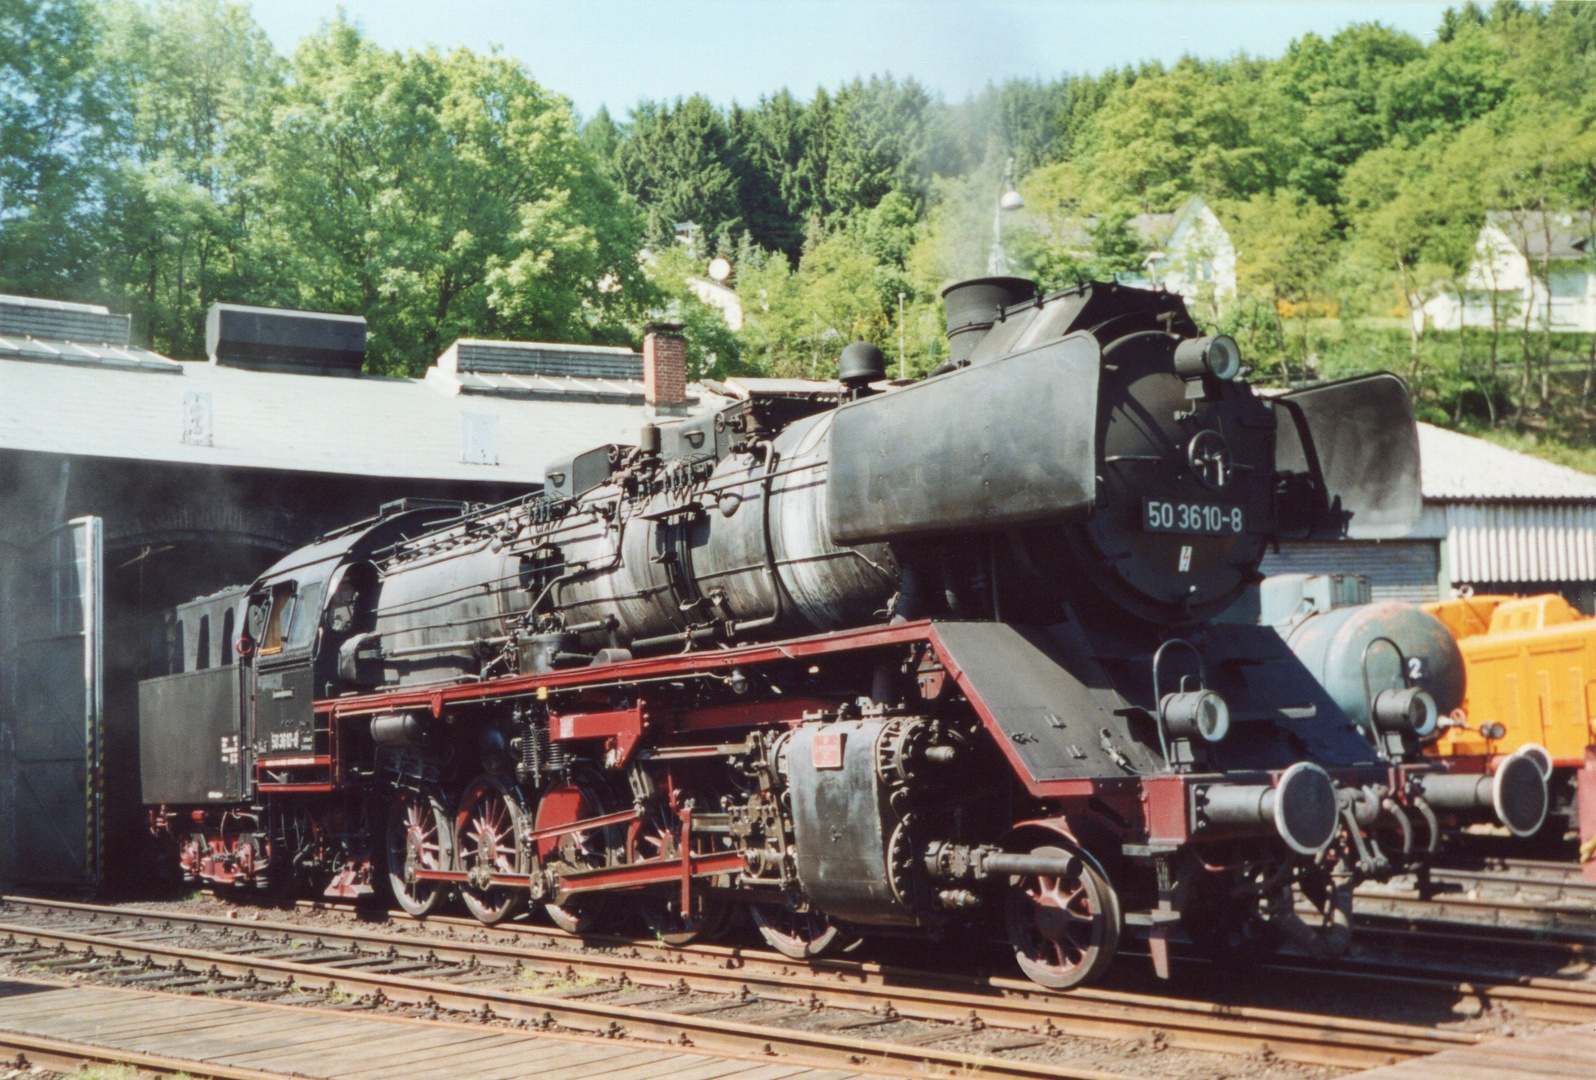 50 3610-8 im EBM Dieringhausen